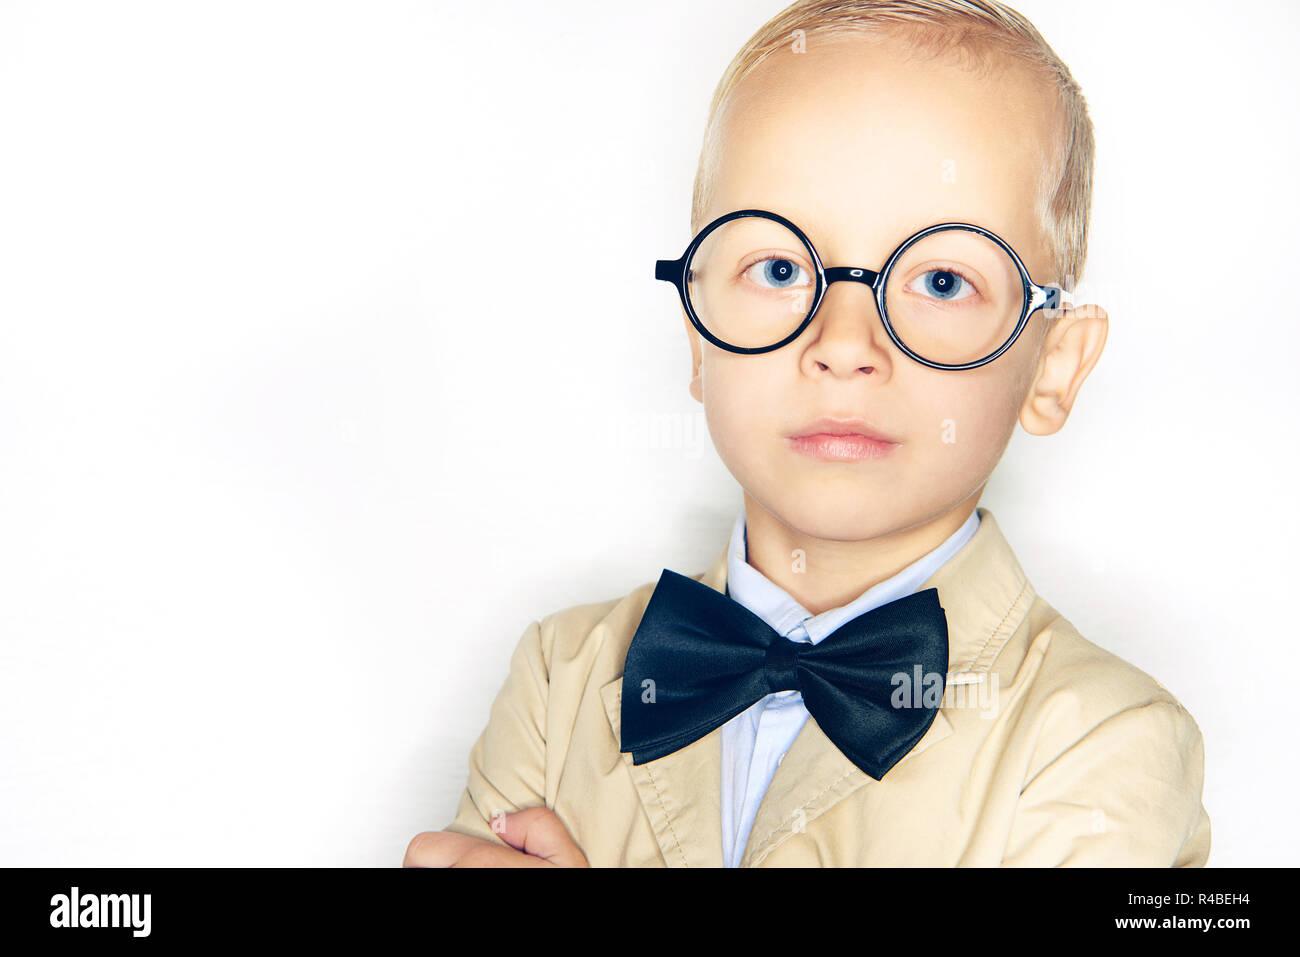 c3ea36fffdc5 Cute little blonde boy dressed like a professor wearing a suit, bowtie and  glasses standing